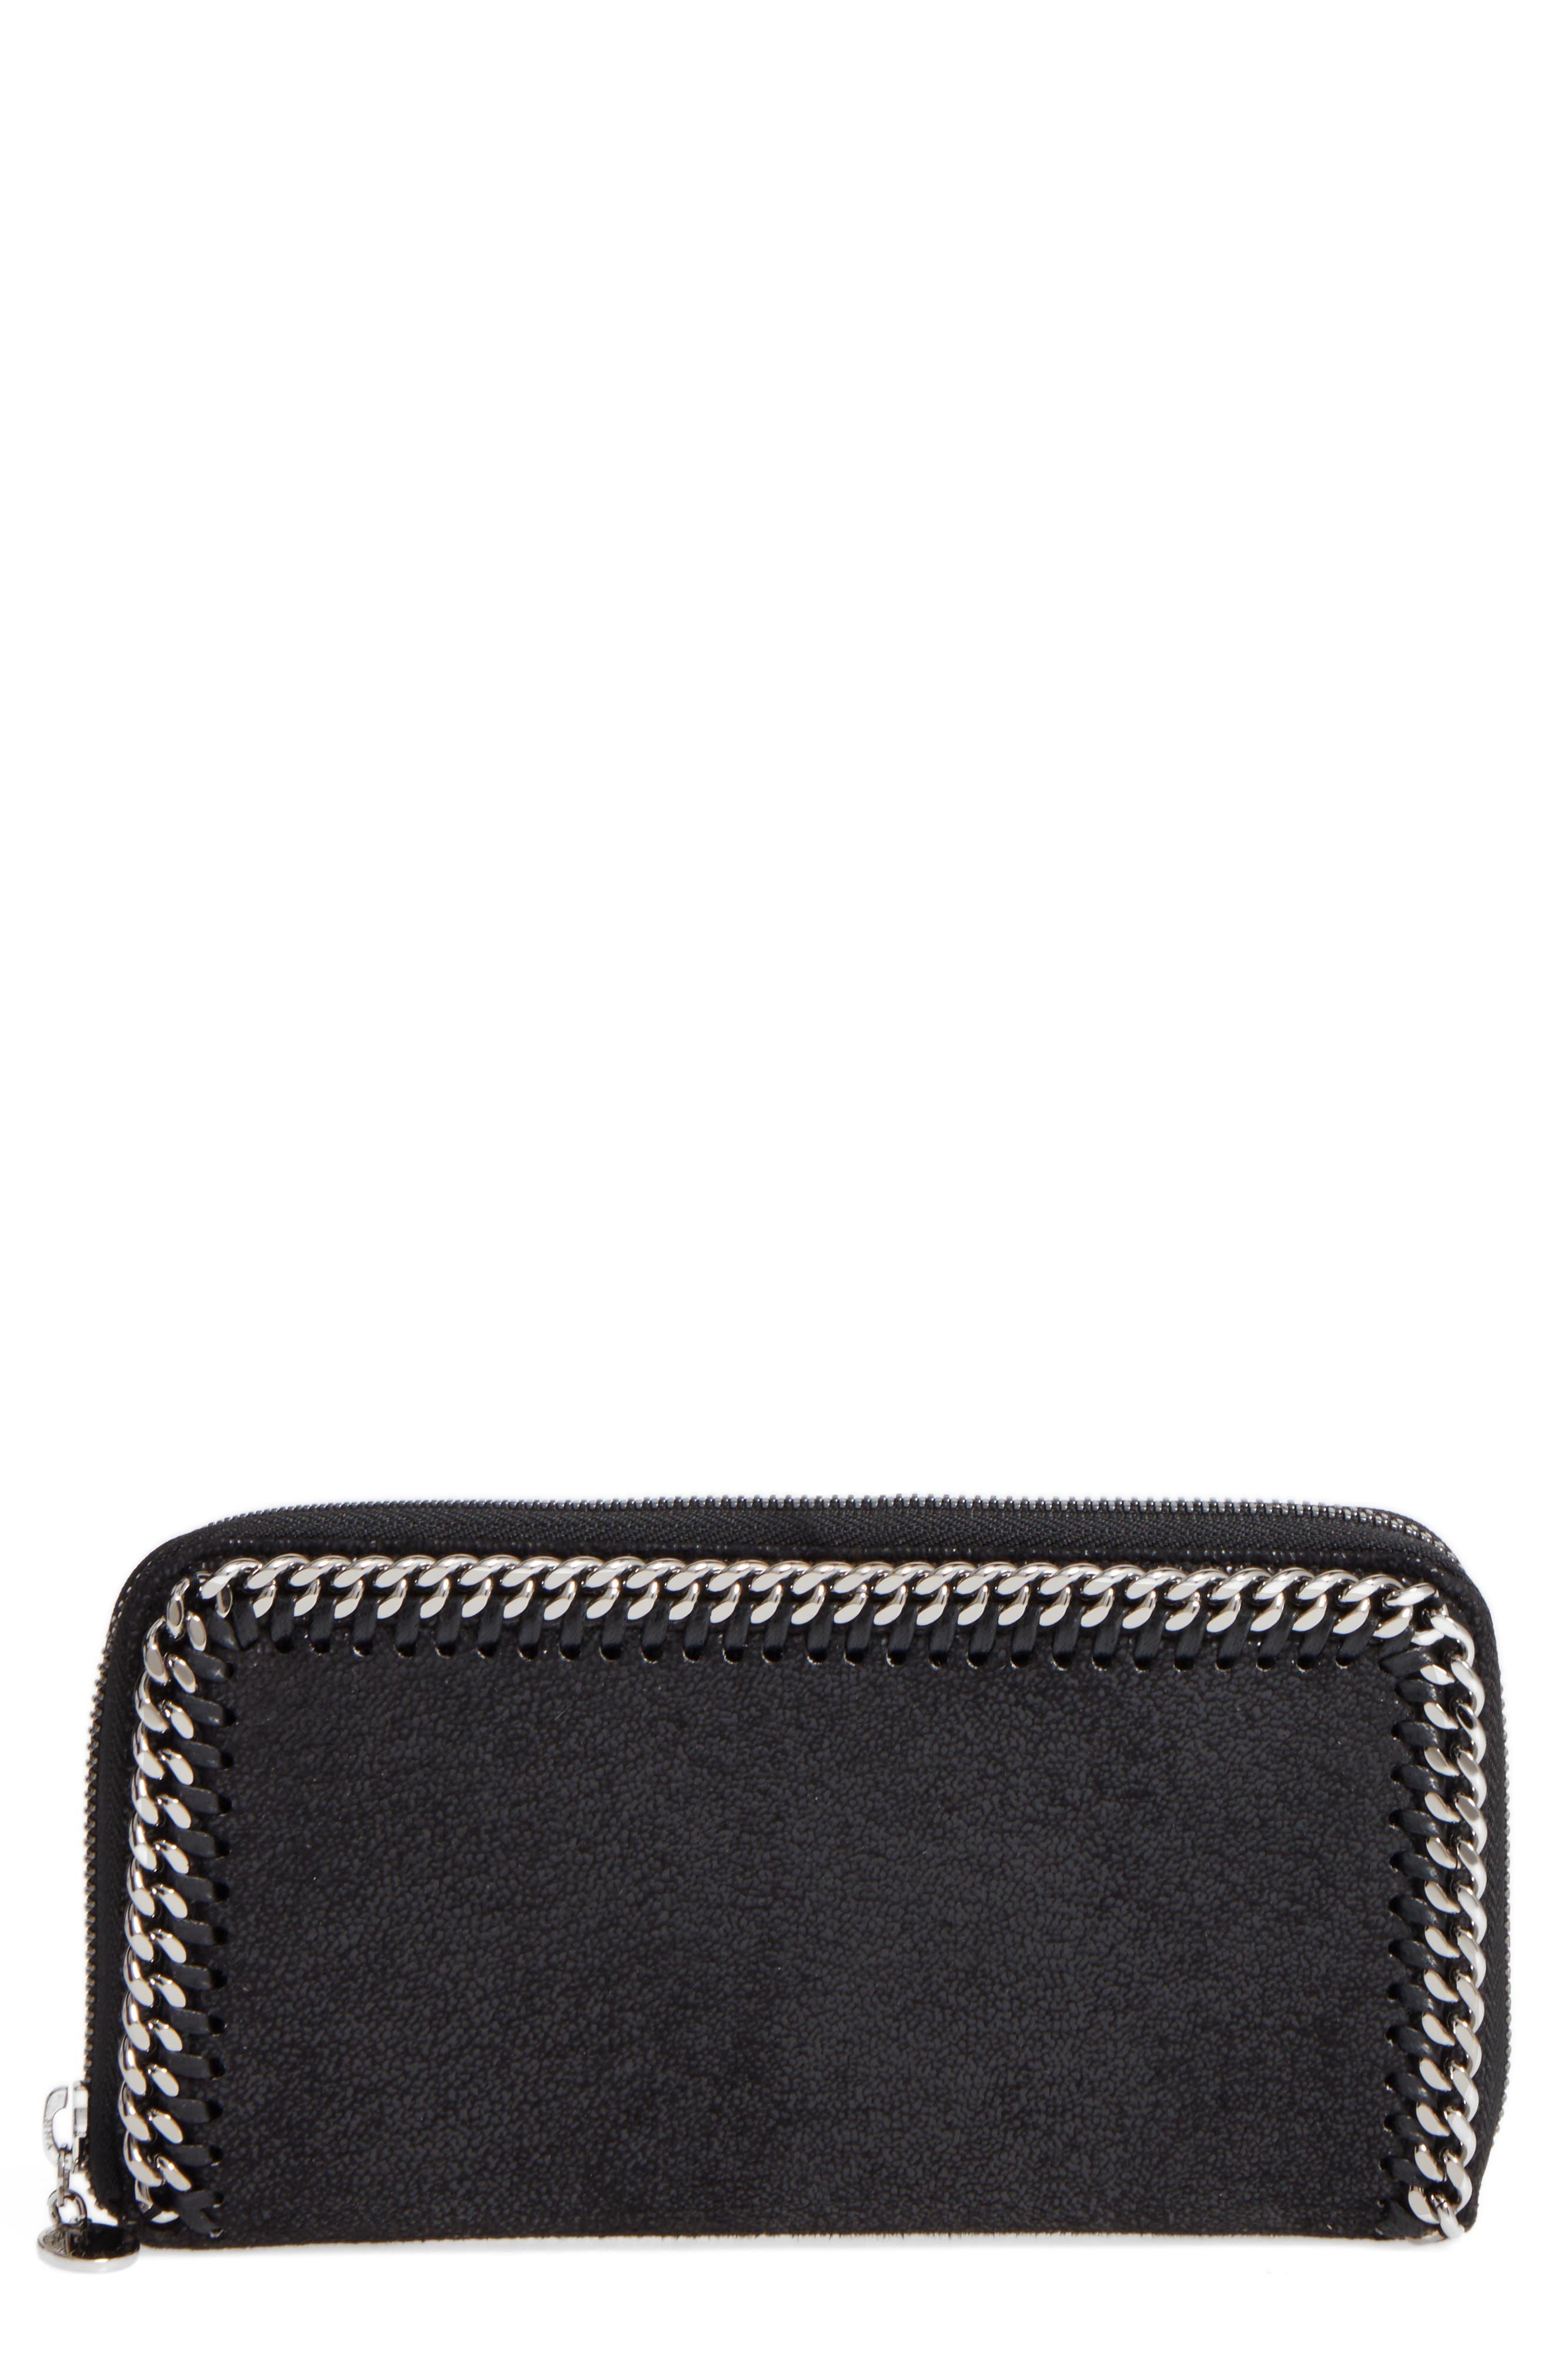 Falabella Faux Leather Wallet,                         Main,                         color, 001